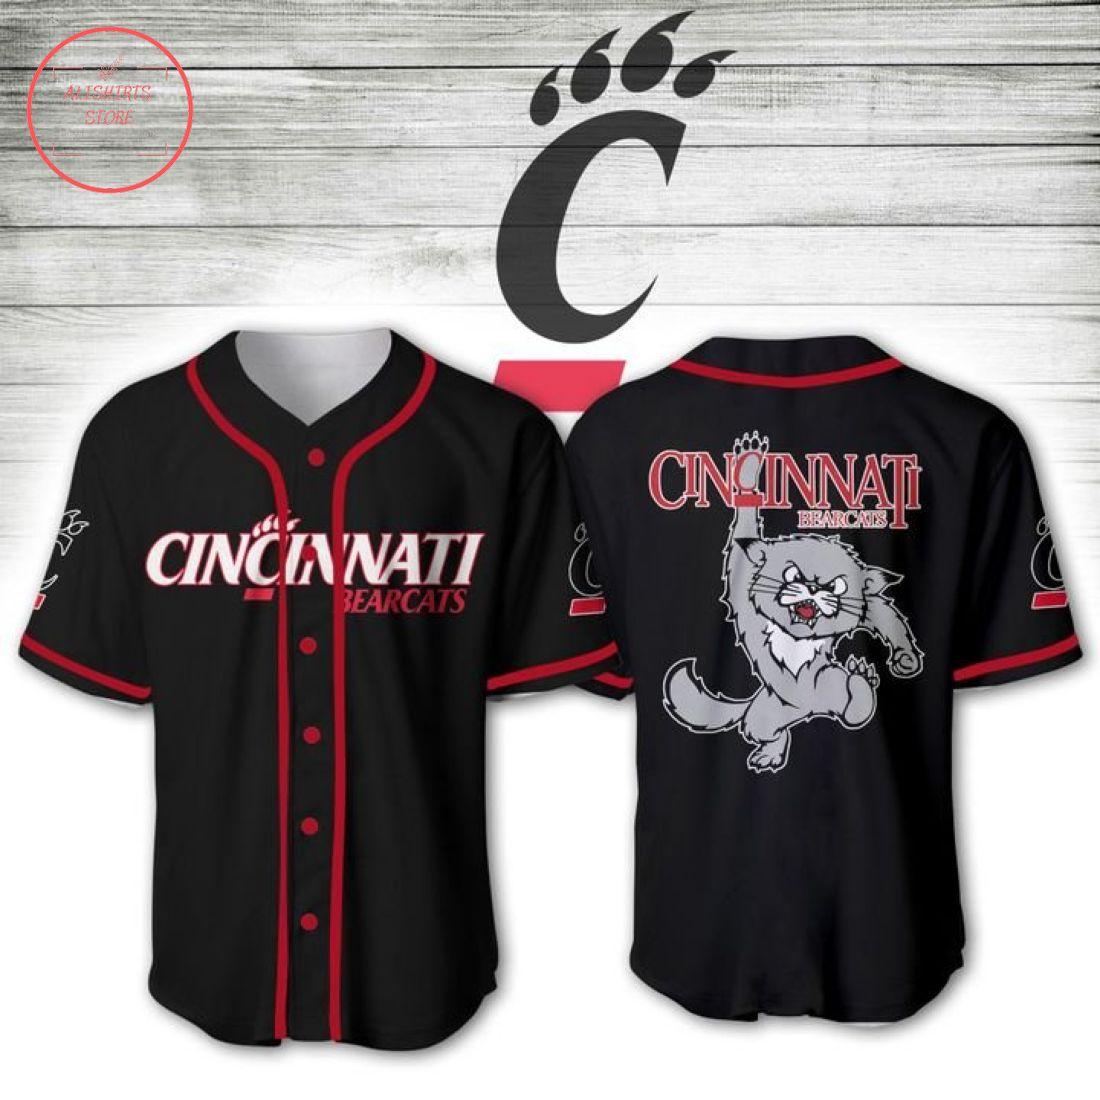 Cincinnati Bearcats NCAA Baseball Jersey